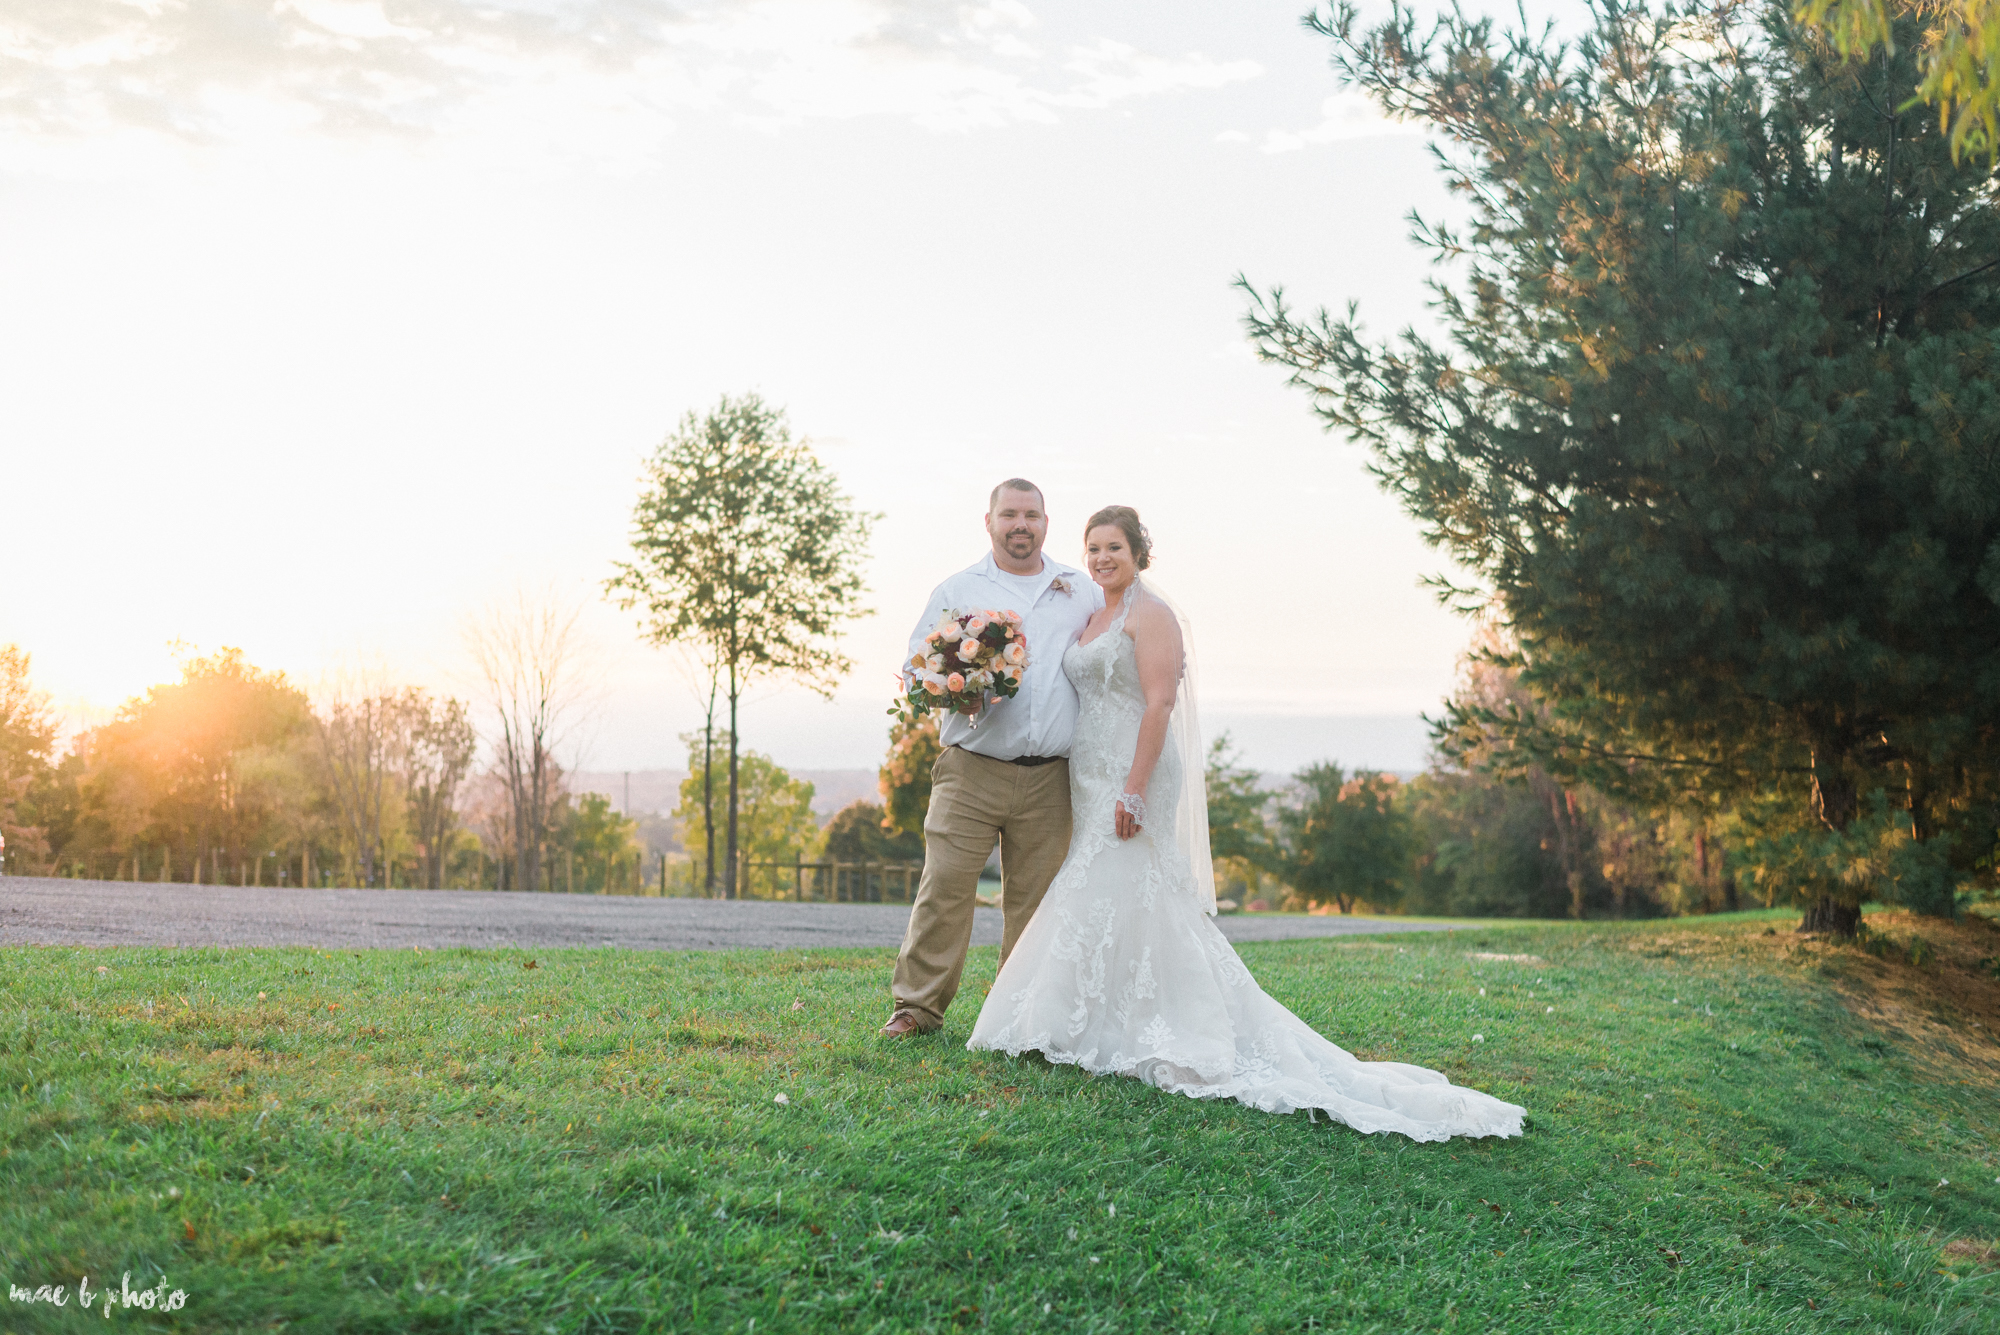 Sarah & Dustin's Rustic Chic Barn Wedding at Hartford Hill Winery in Hartford, Ohio by Mae B Photo-85.jpg